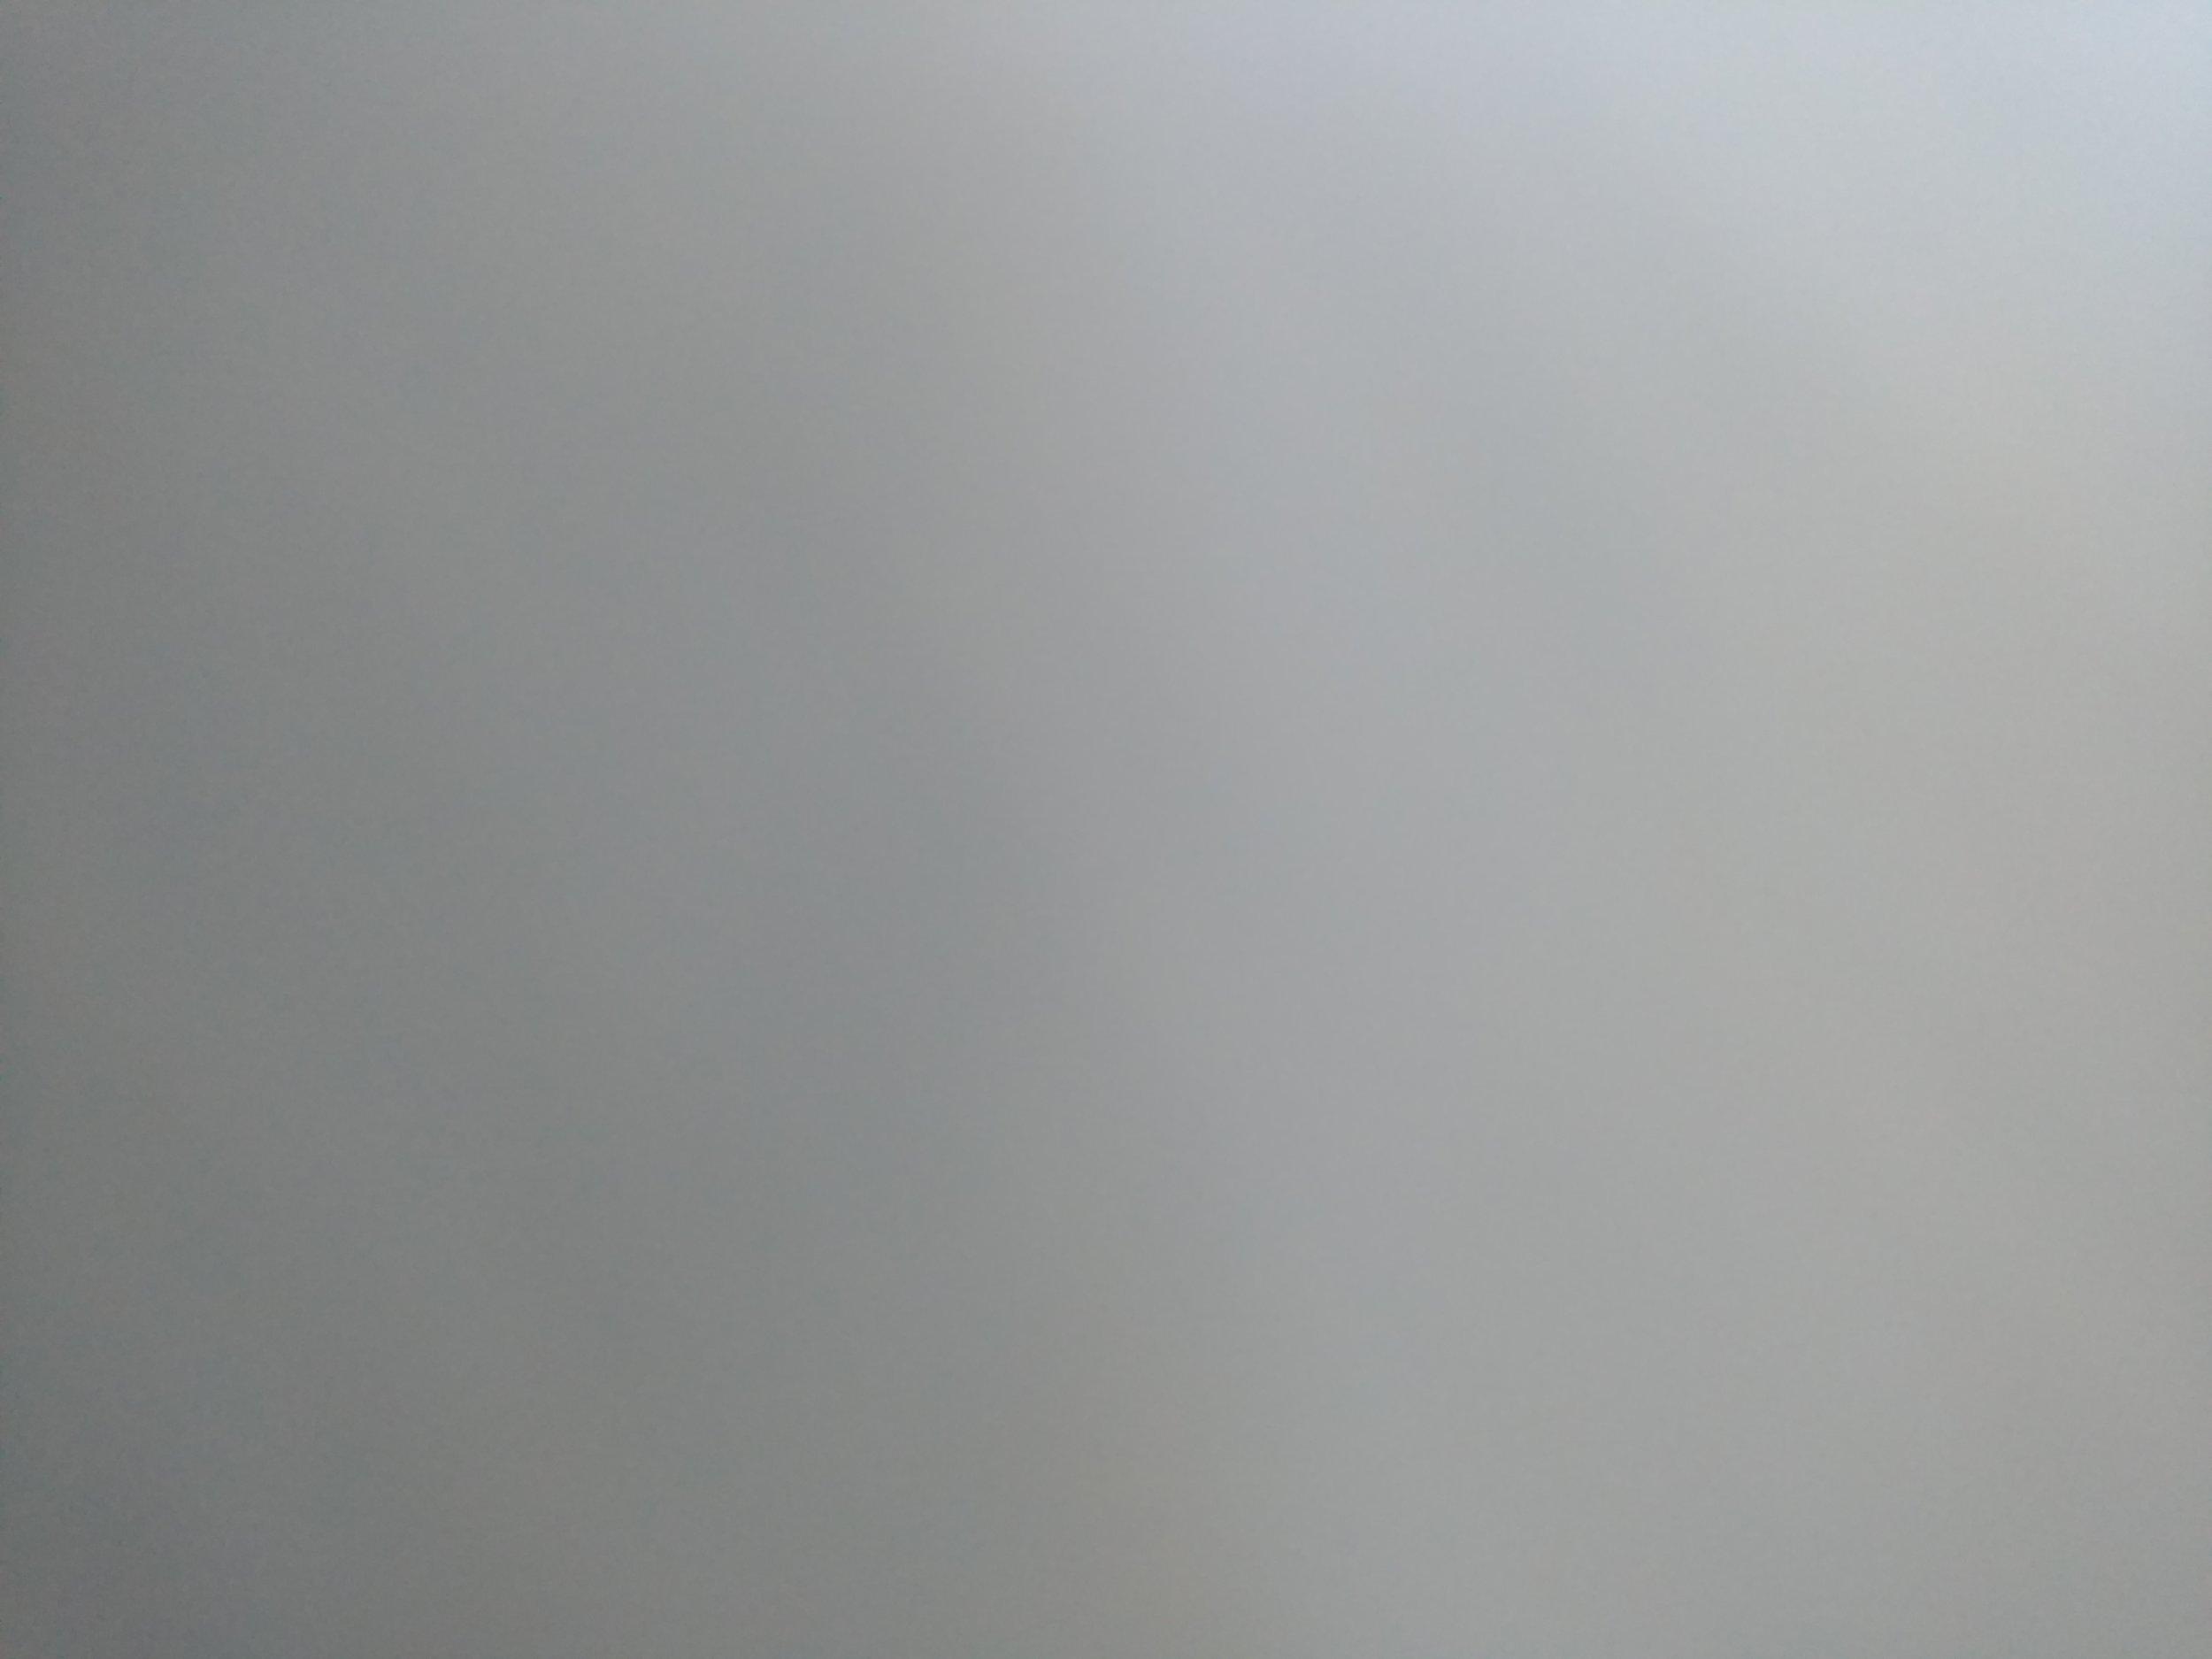 willroth-co-free-texture-gradient-068.jpg